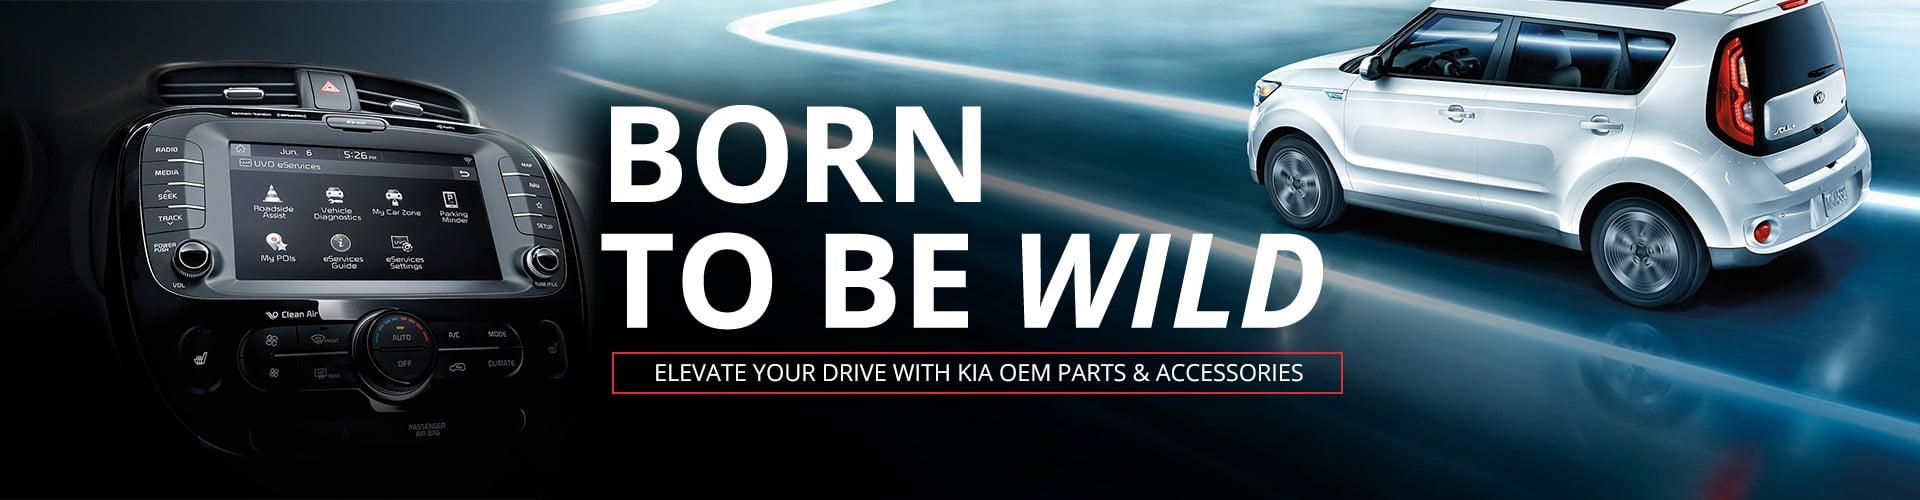 OEM Kia Parts & Accessories